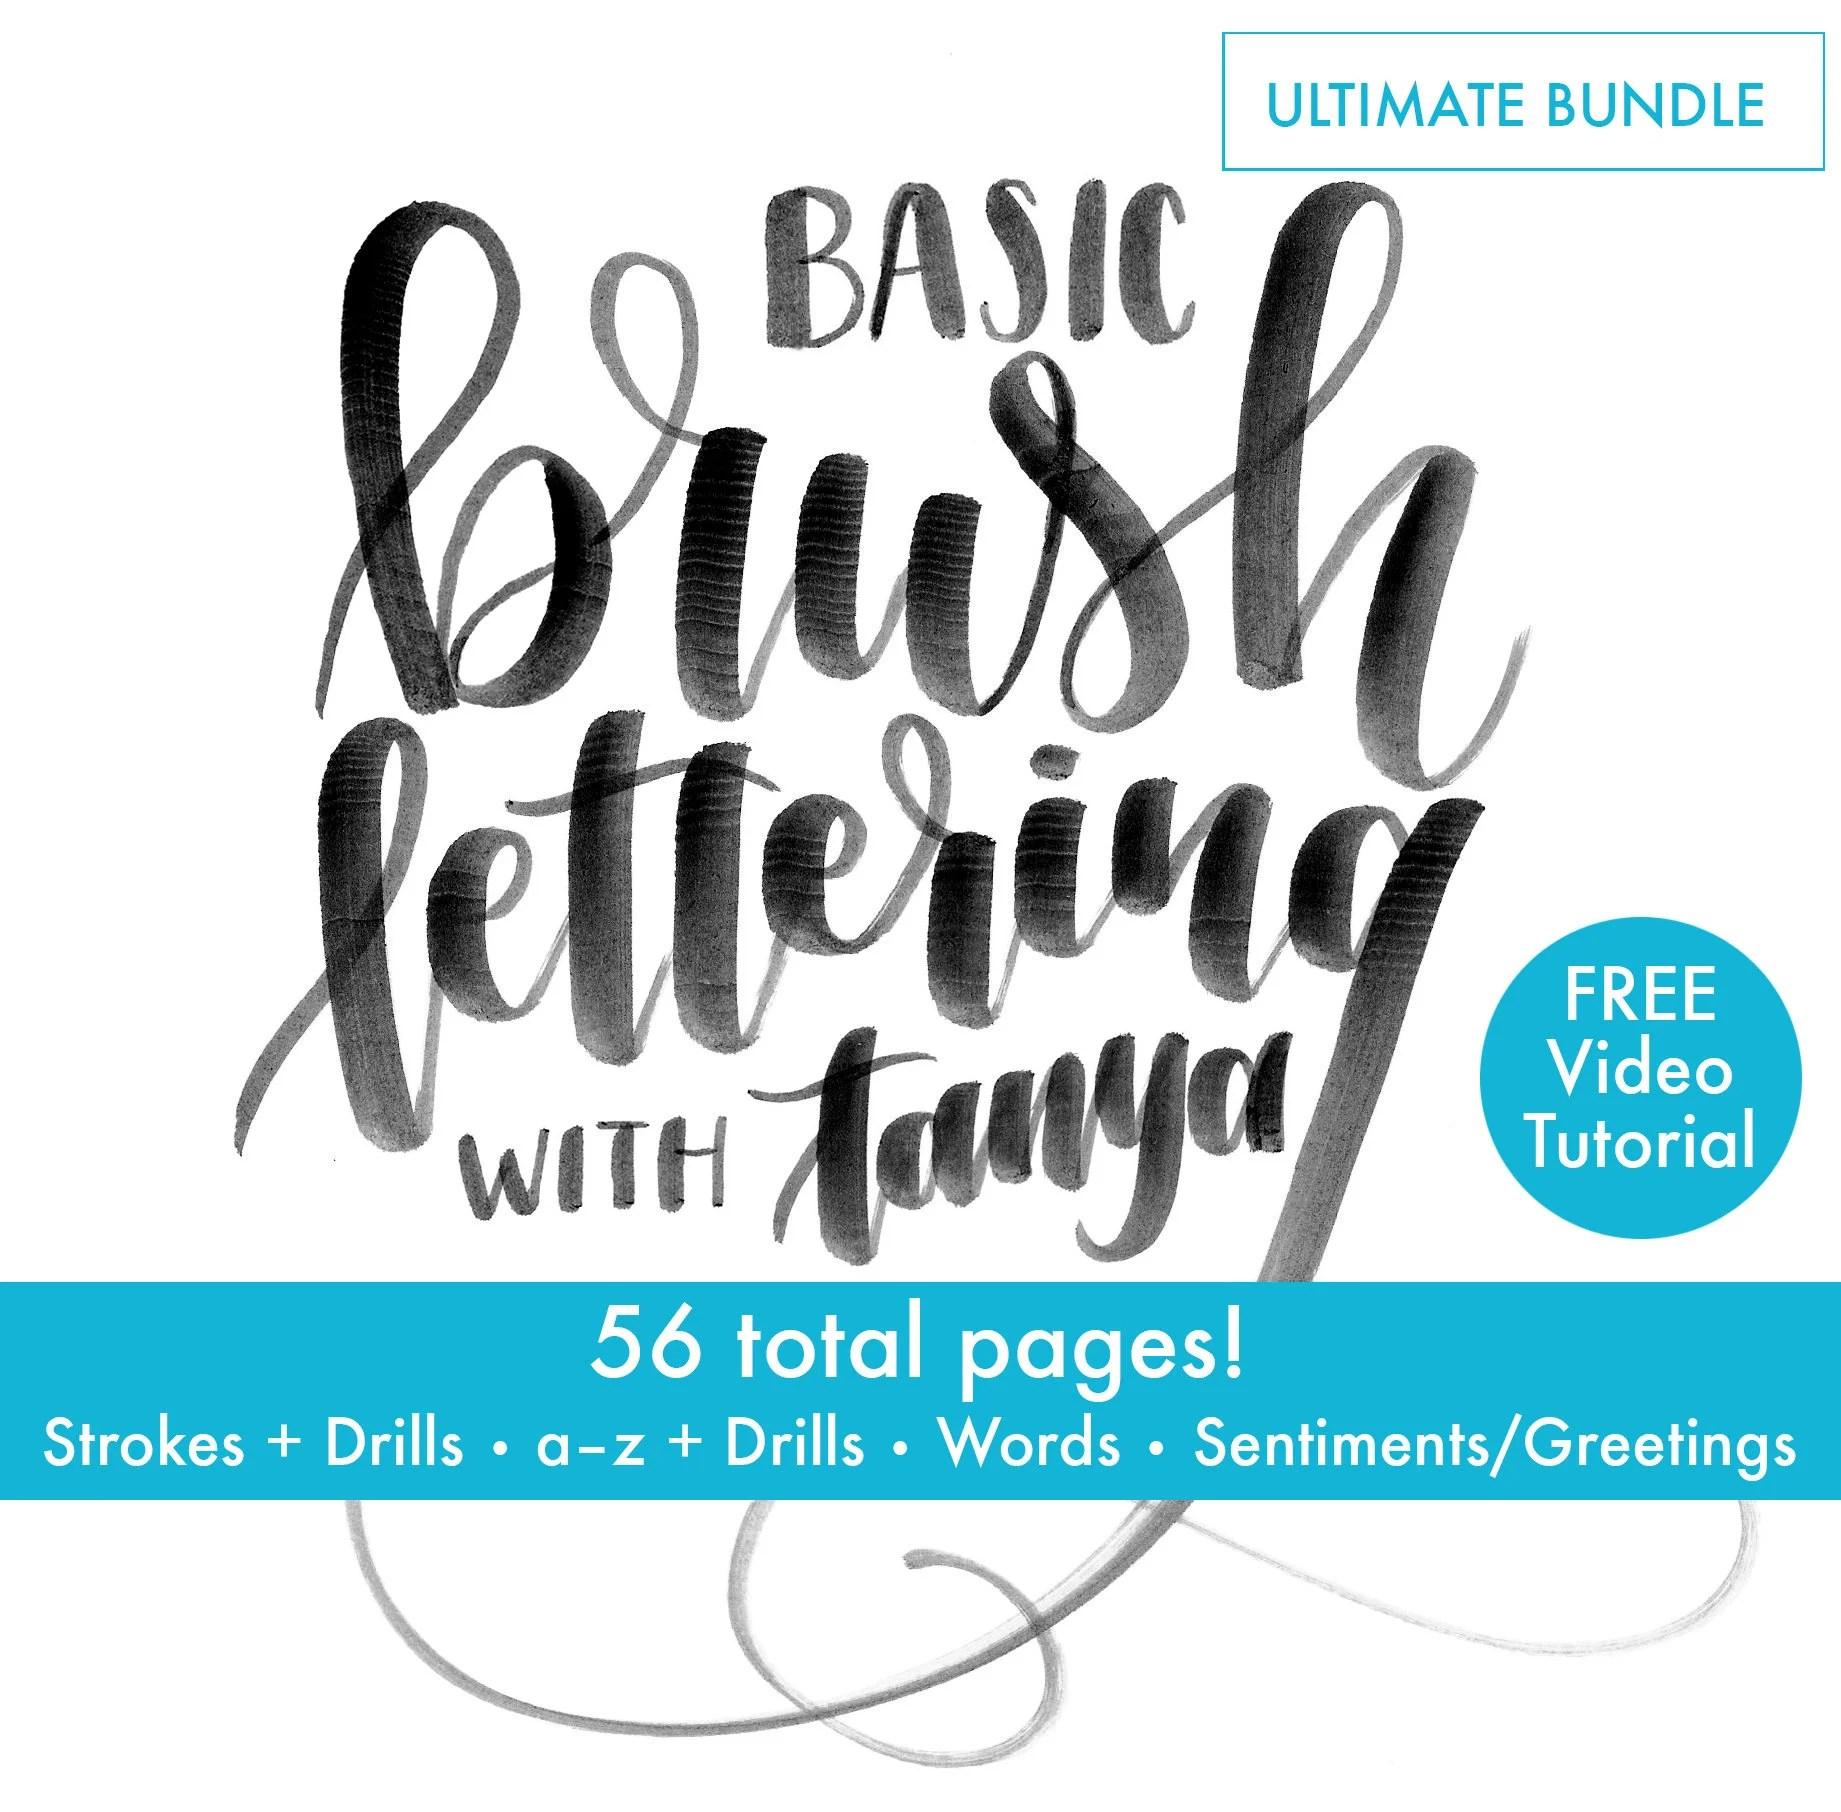 Ultimate Bundle Perfect Beginner Set Brush Lettering